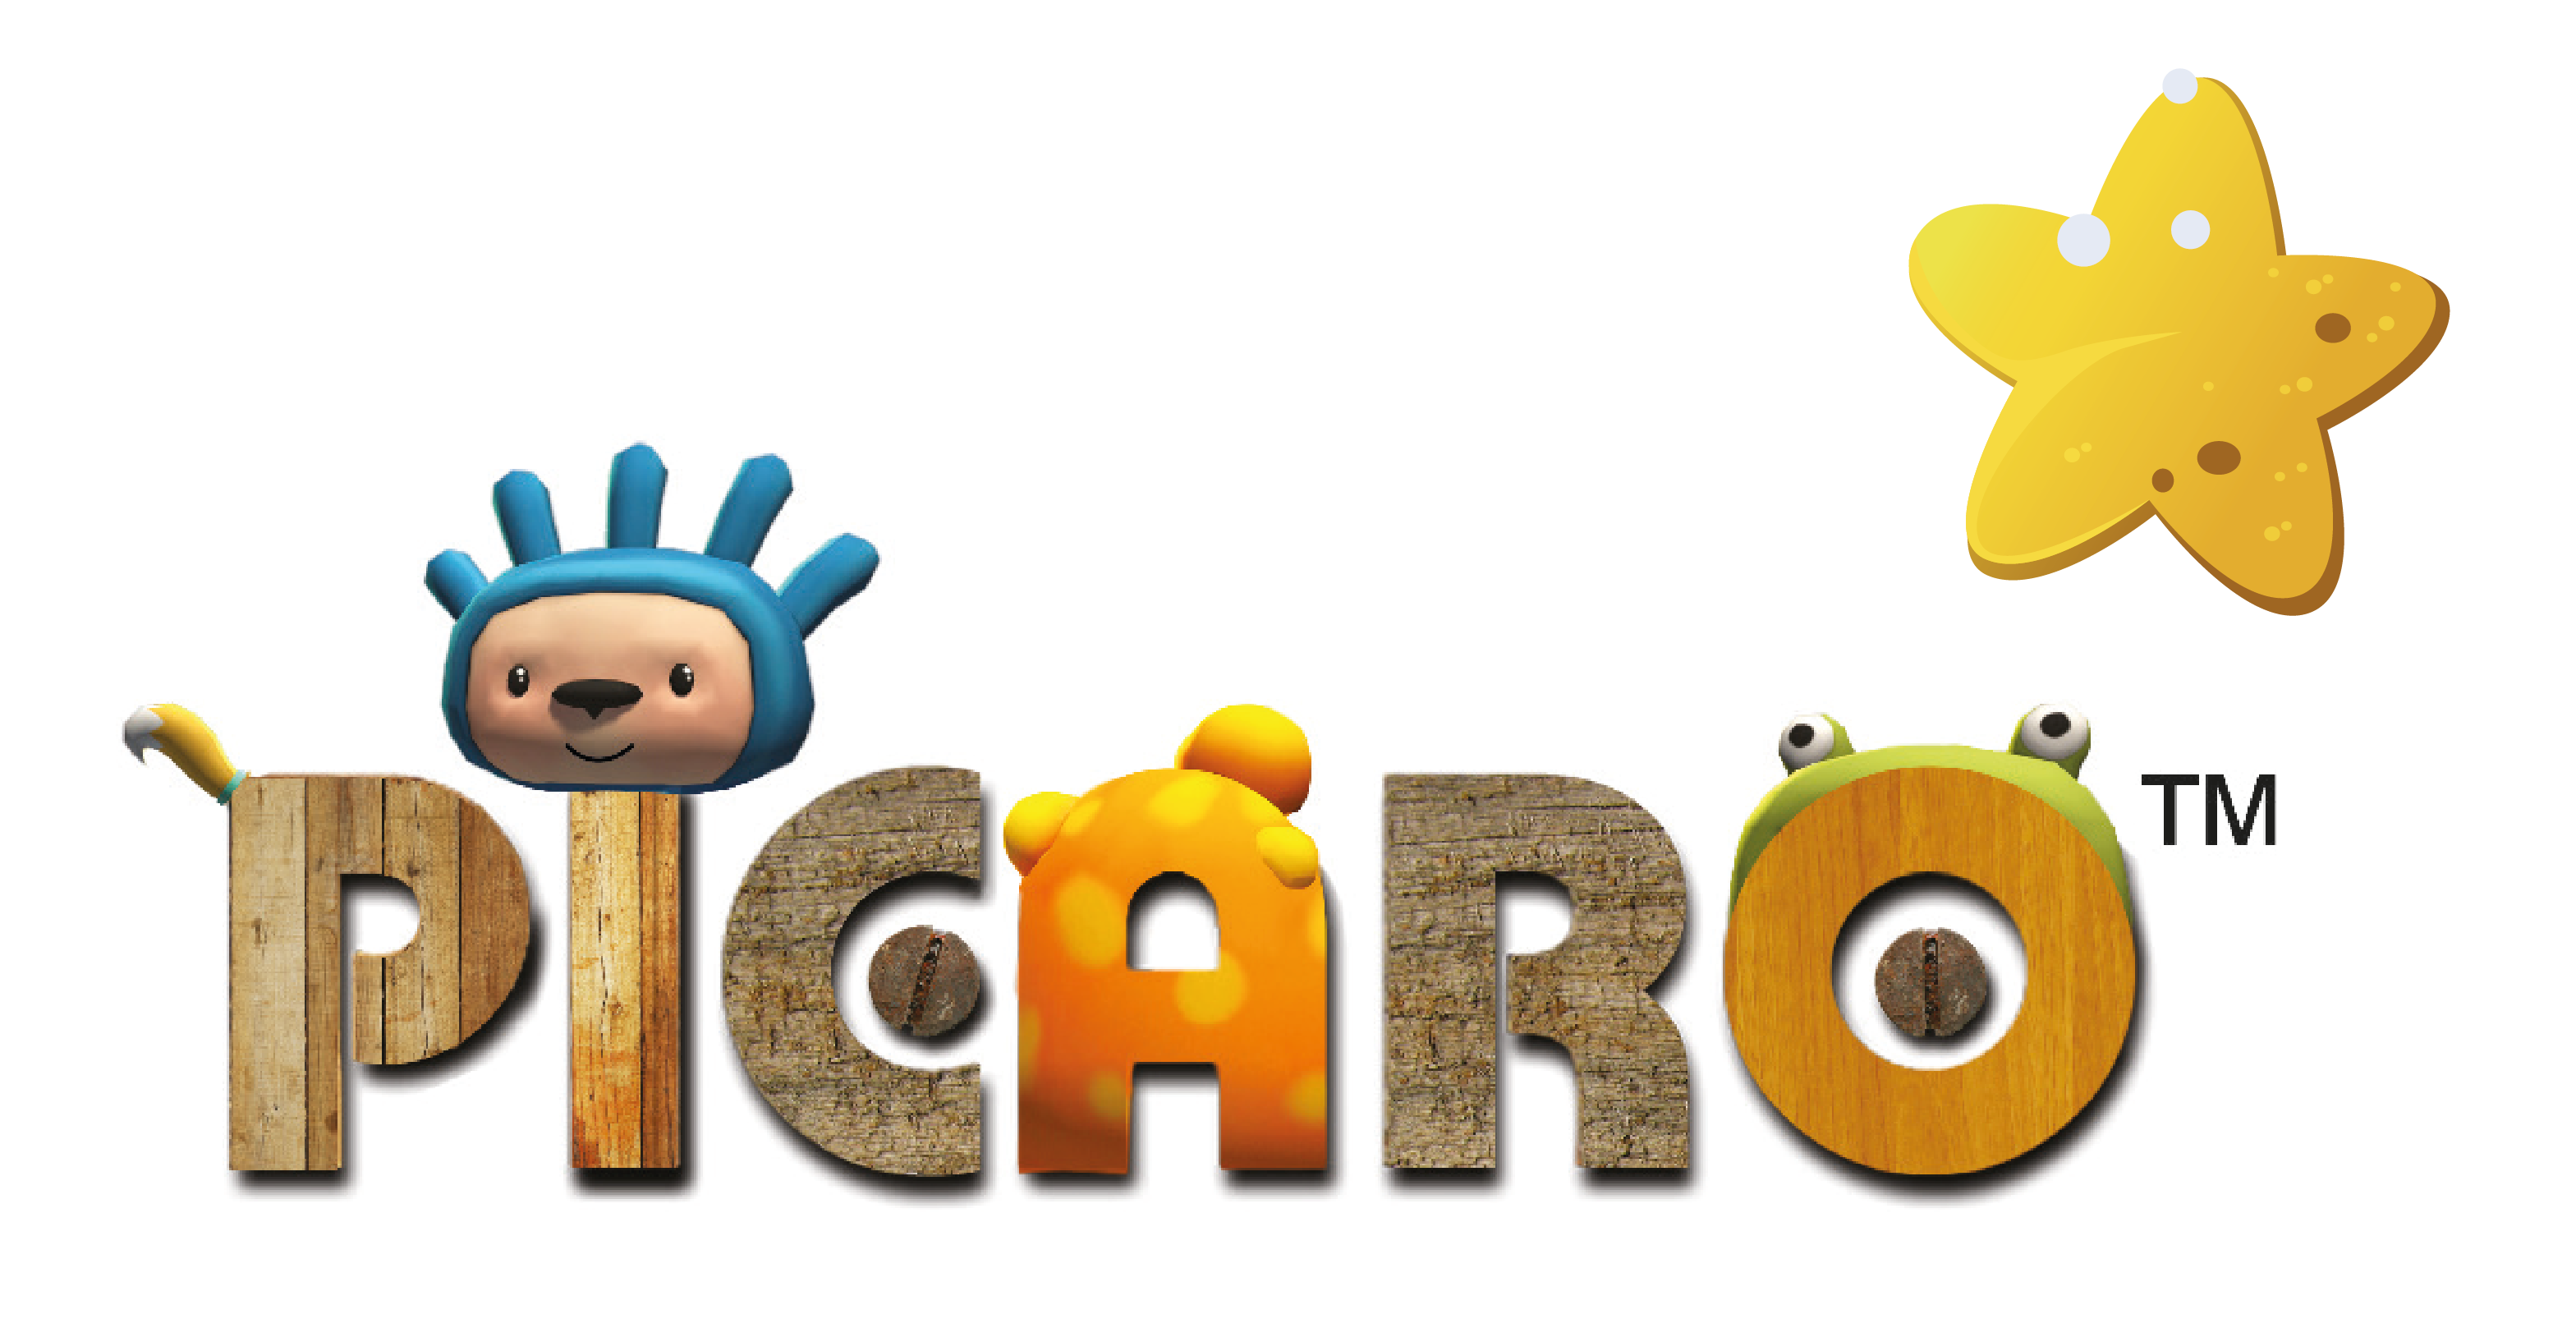 Picaro logo